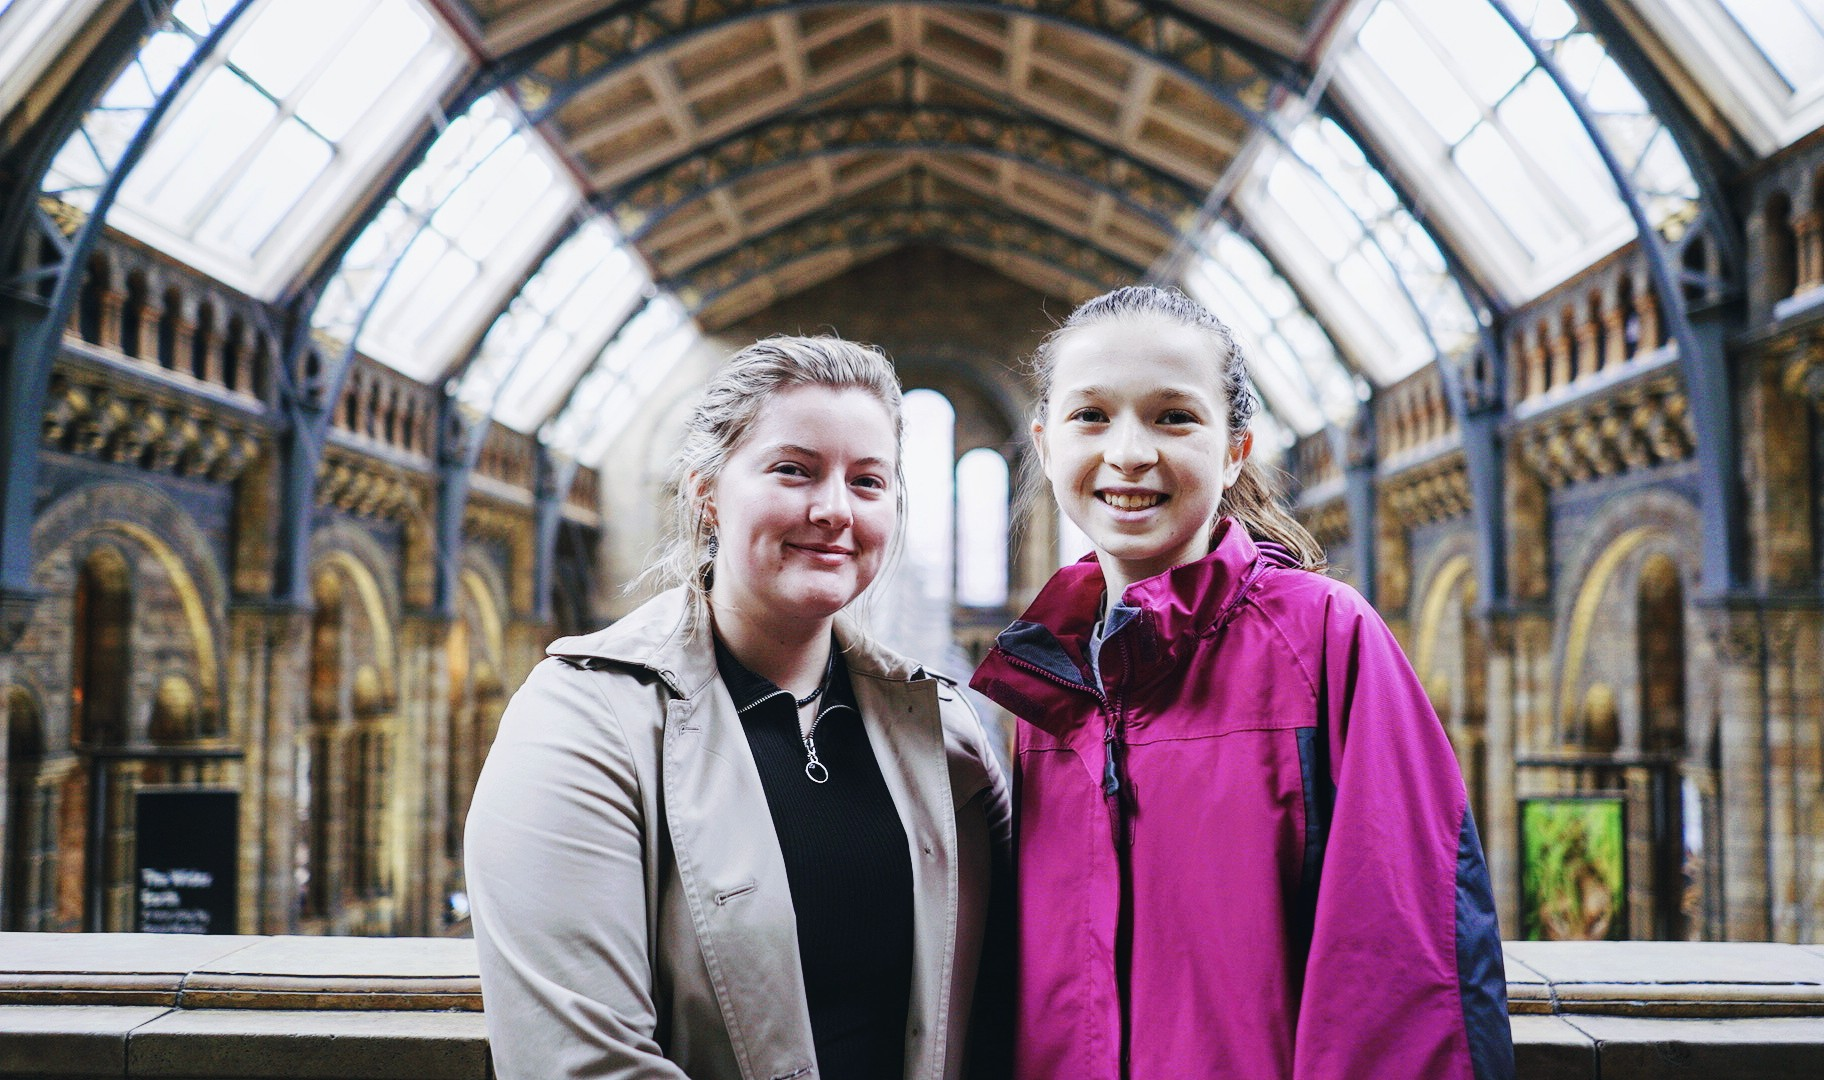 Gemma & Katelyn - Students for Environmental Change